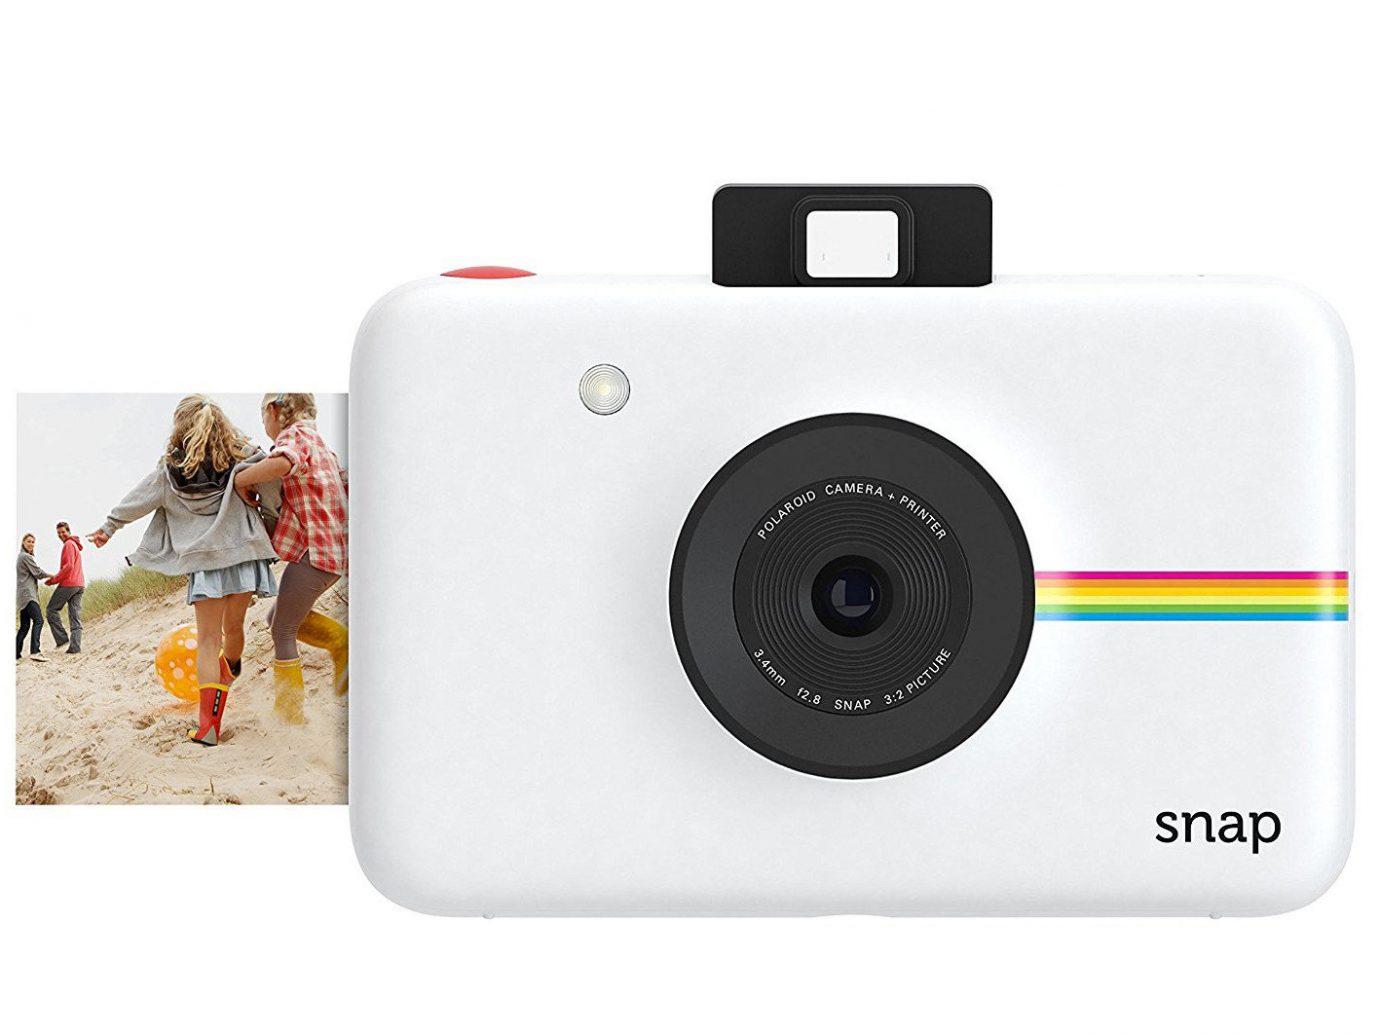 Gift Guides Travel Shop cameras & optics camera product digital camera product design camera lens mirrorless interchangeable lens camera kitchen appliance